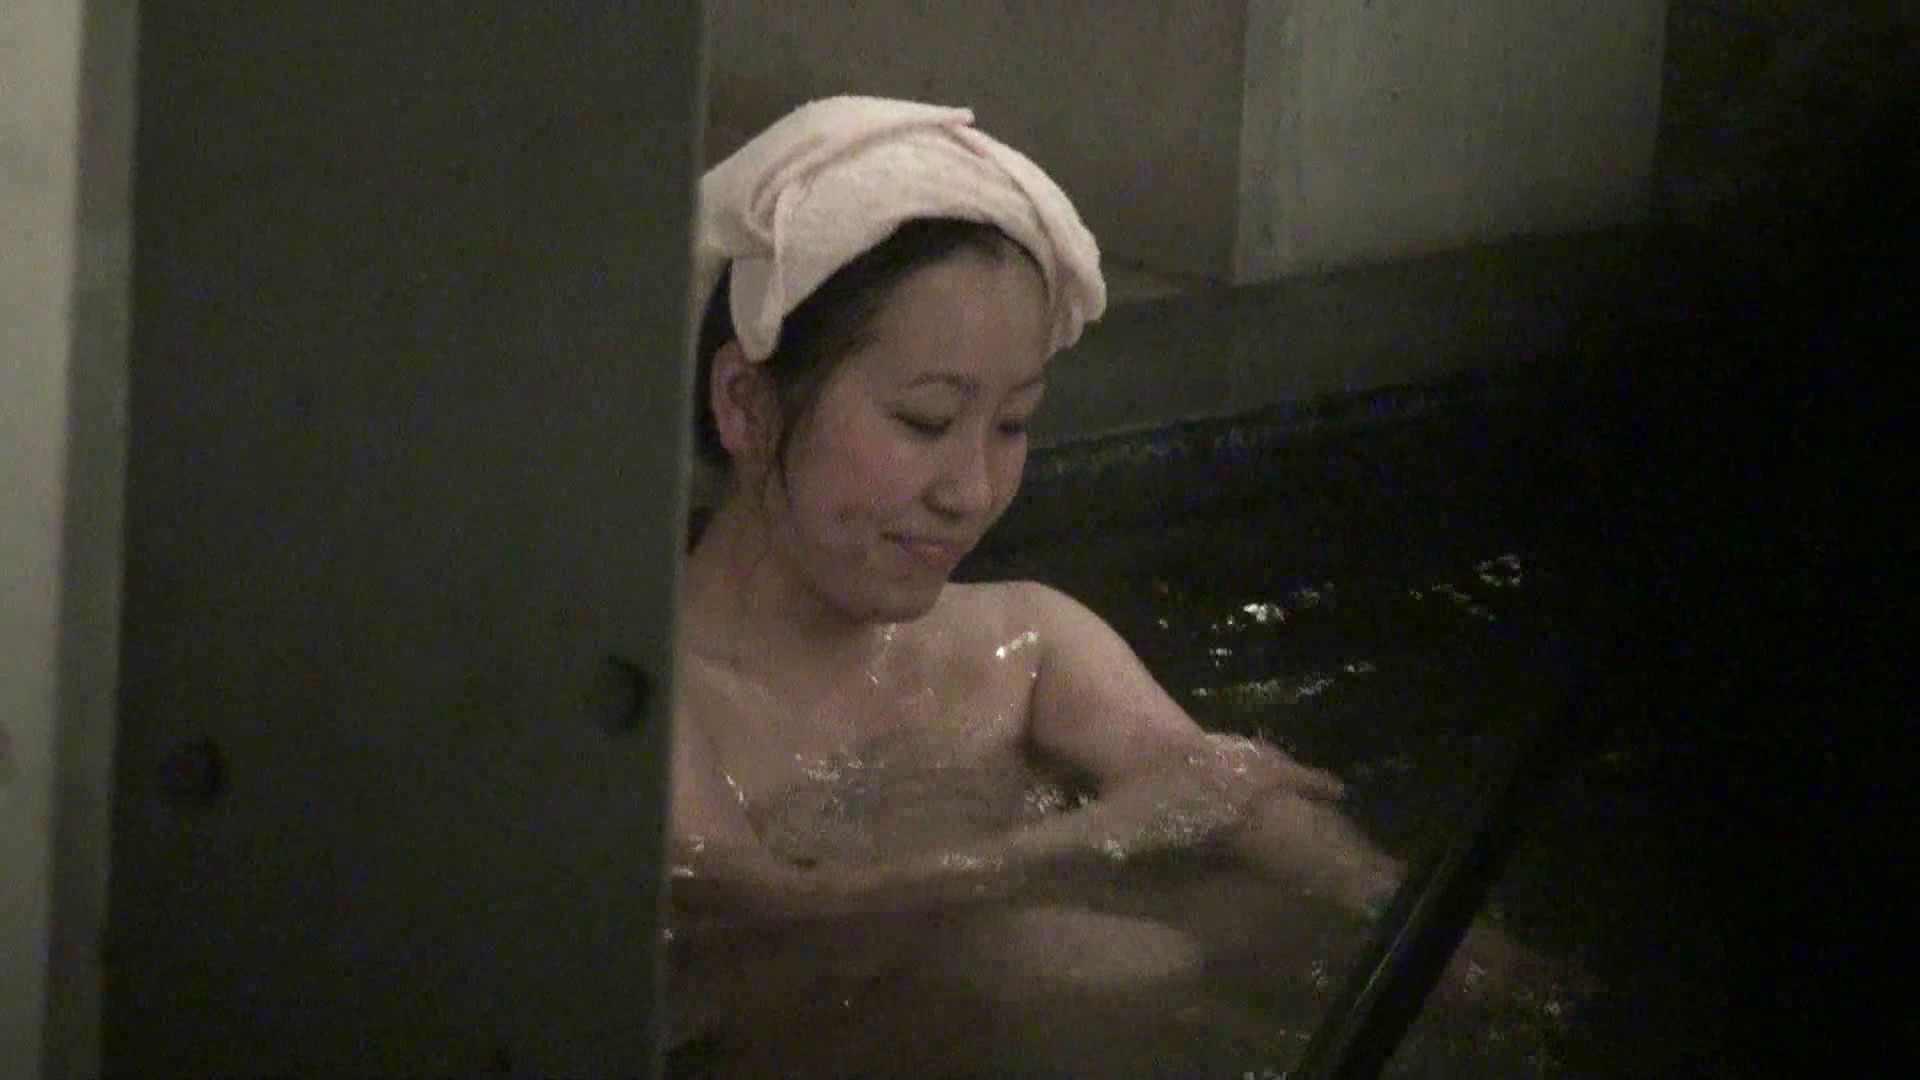 Aquaな露天風呂Vol.416 0 | 0  106連発 35